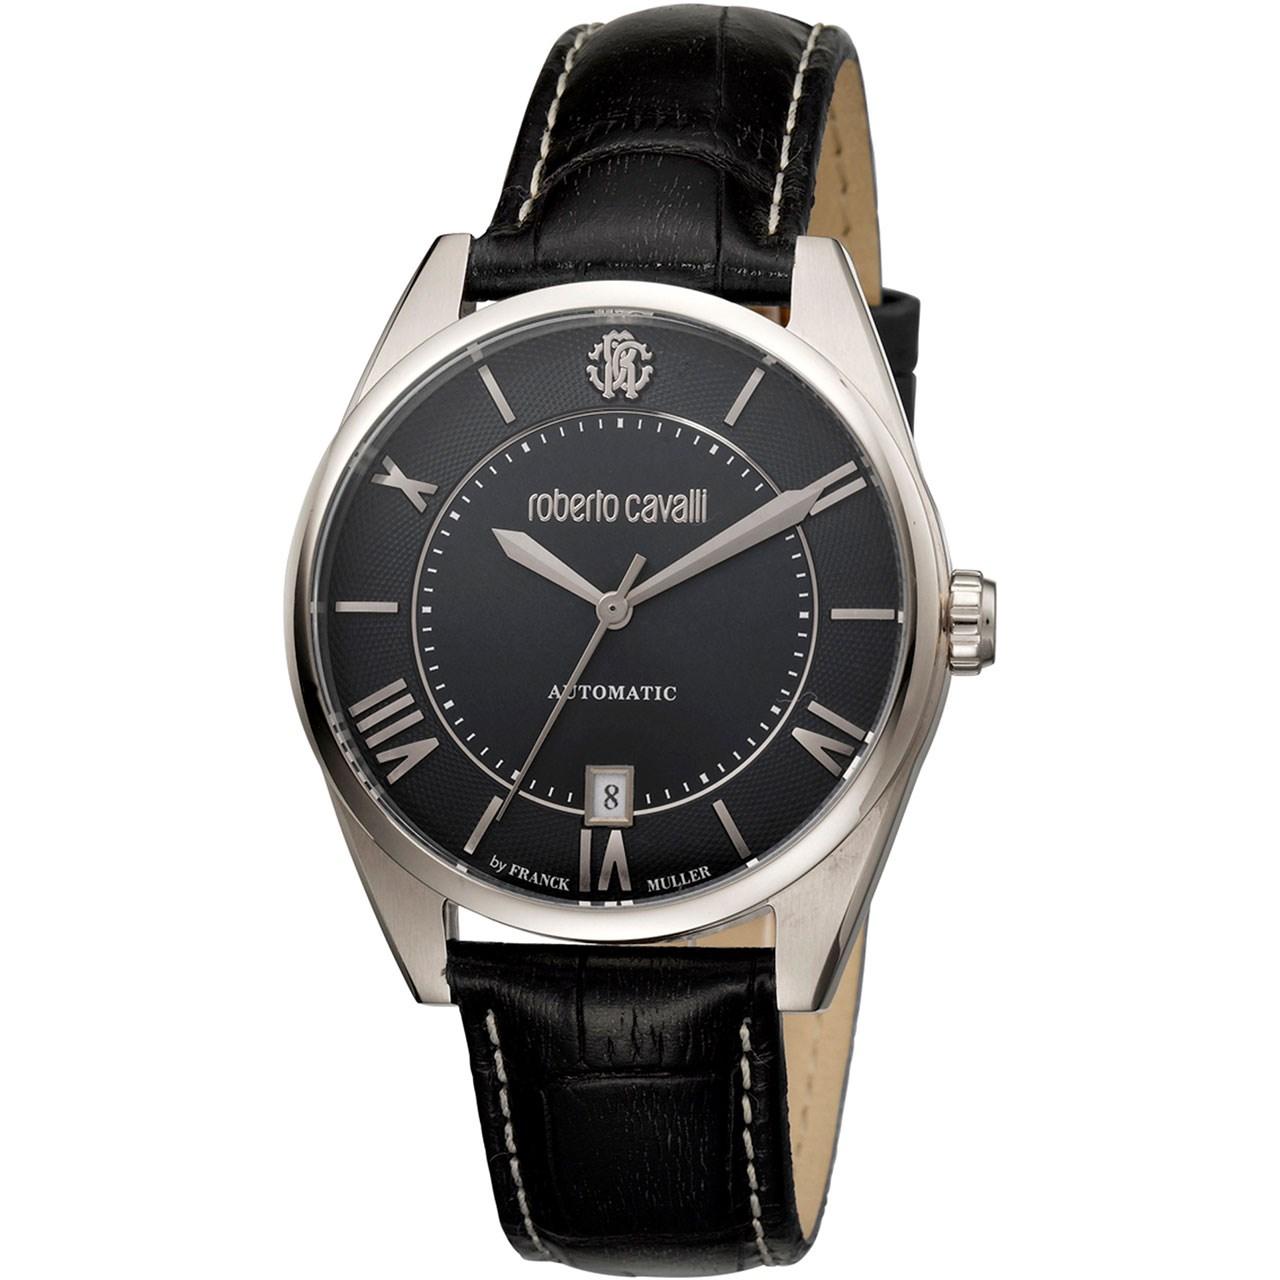 ساعت مچی عقربه ای مردانه روبرتو کاوالی مدل RV1G013L0021